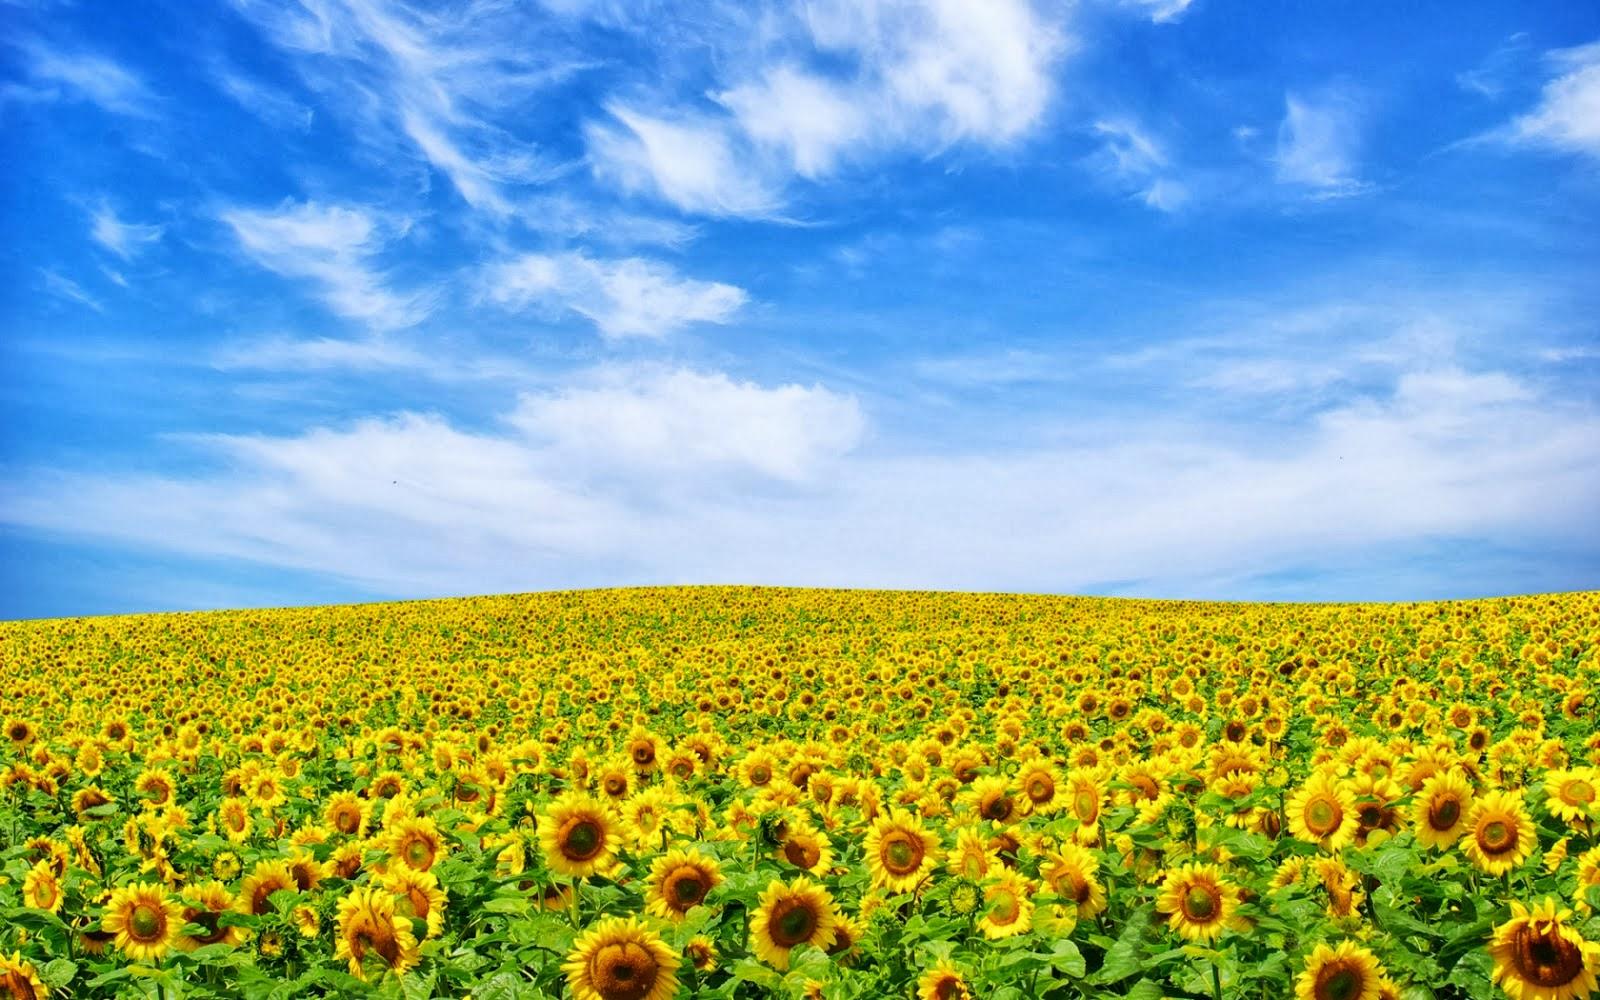 Background Lukisan Bunga Matahari Koleksi Gambar Hd